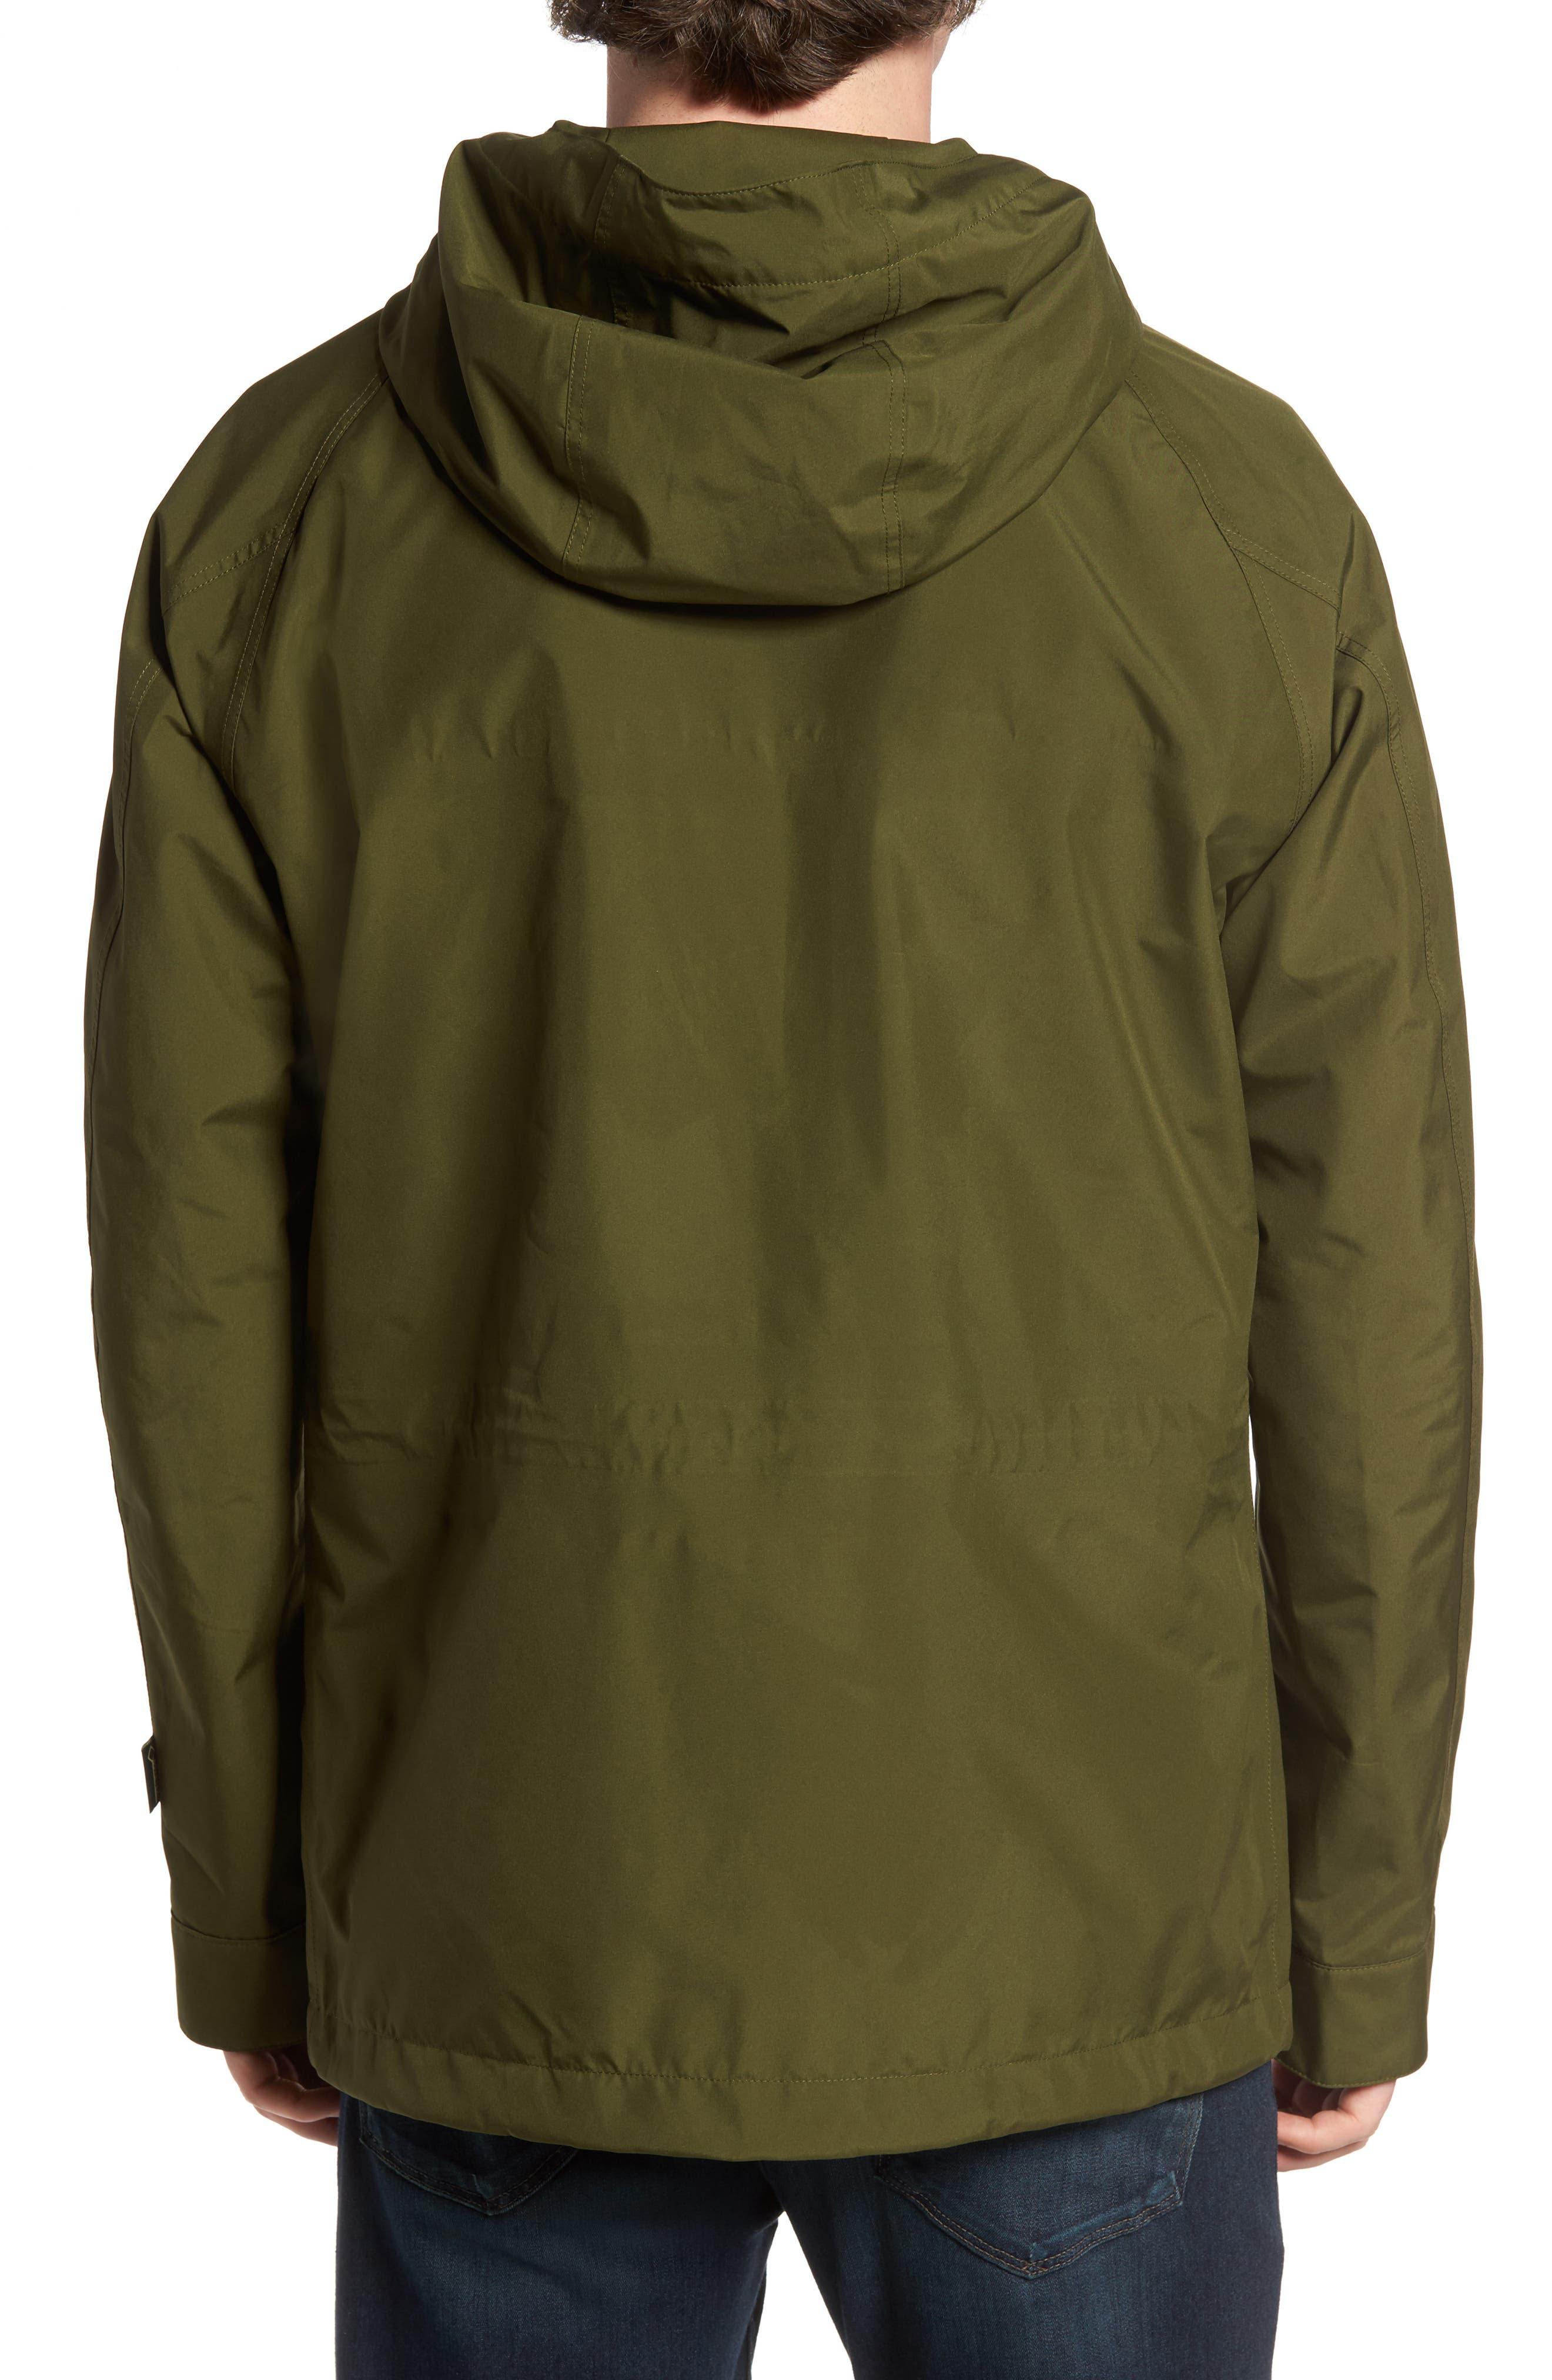 John Rich & Bros. Waterproof Gore-Tex<sup>®</sup> Mountain Jacket,                             Alternate thumbnail 2, color,                             313